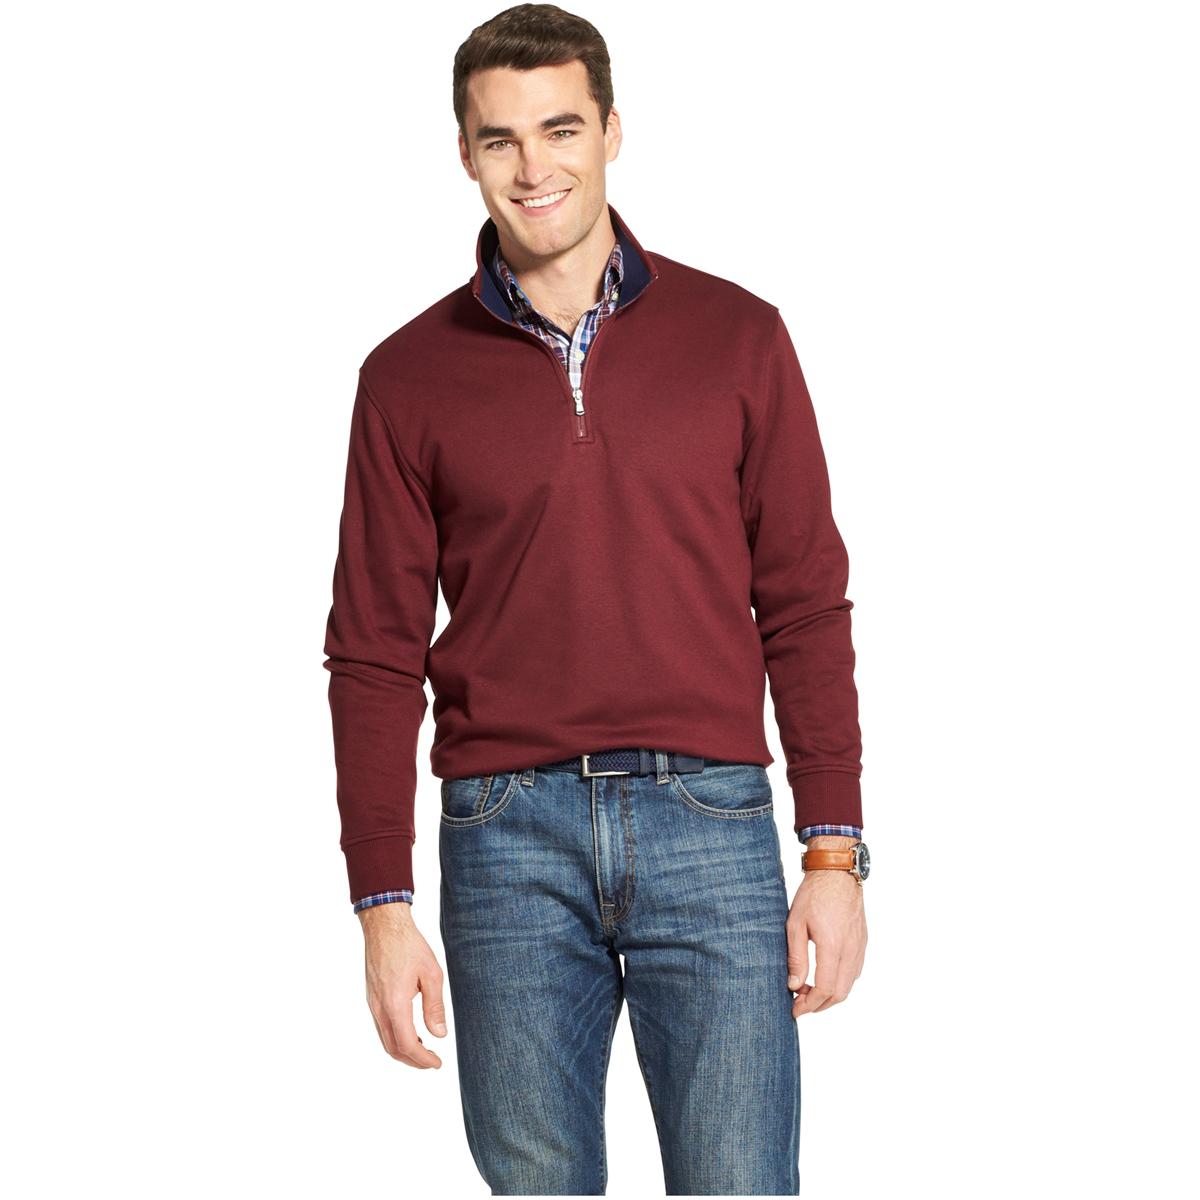 Izod Men's Long-Sleeve Advantage 1/4 Zip Fleece - Red, L